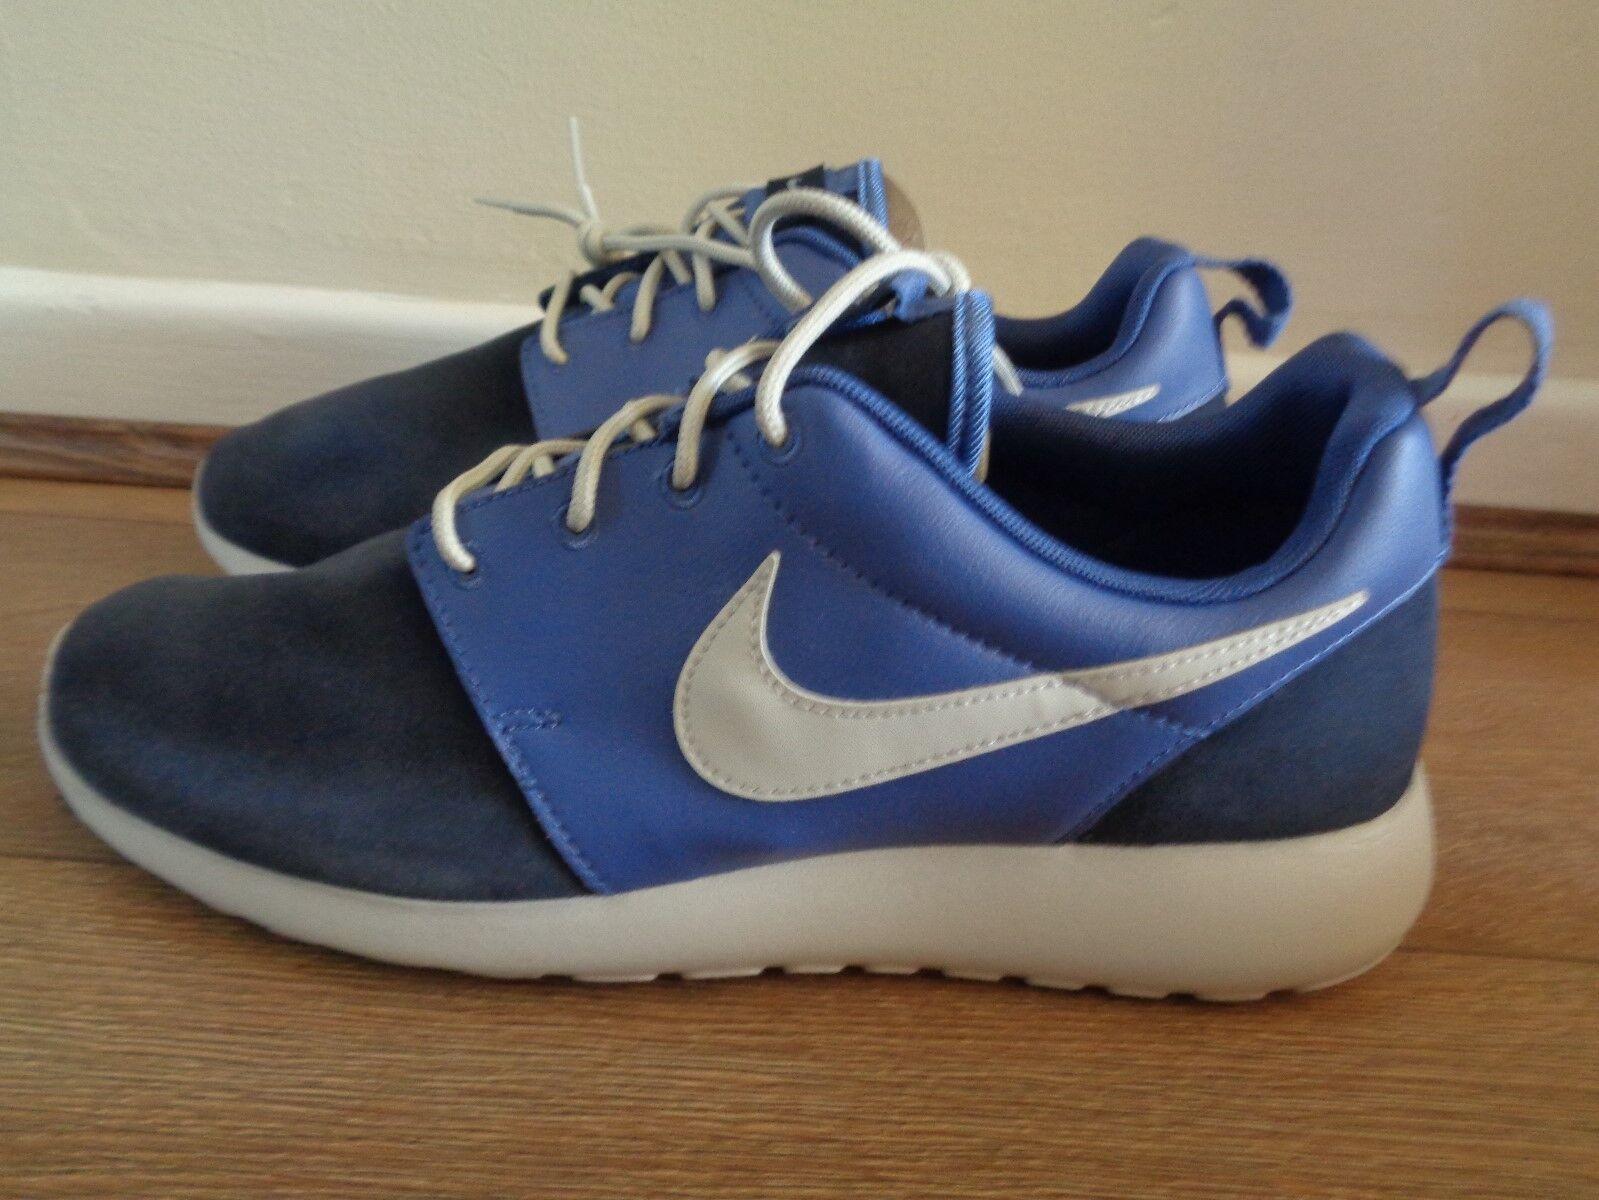 Nike Rosherun Premium homme trainers sneakers chaussures 525234 401 NEW